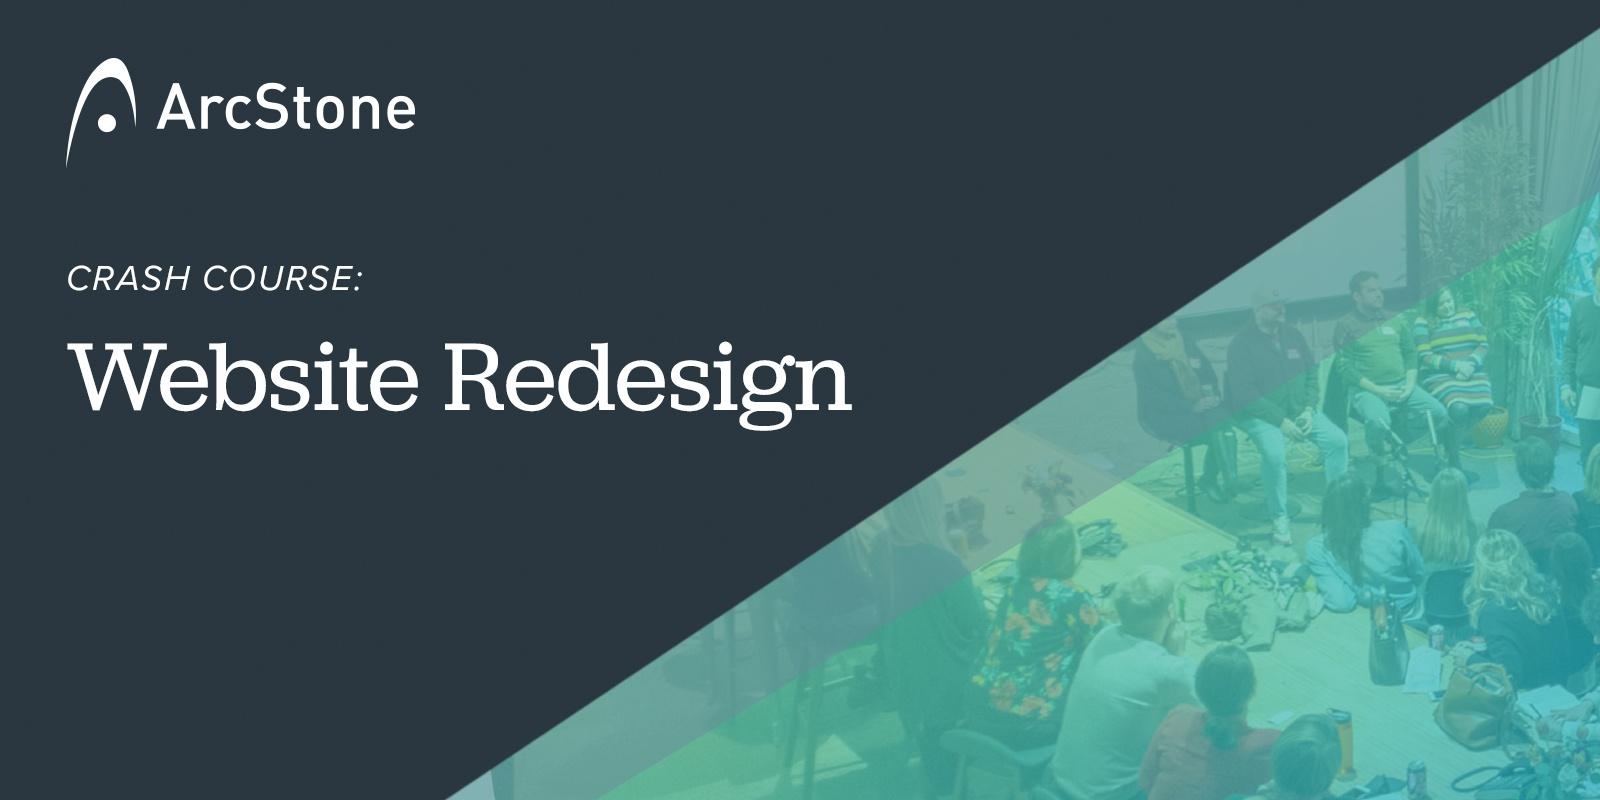 Crash Course: Website Redesign